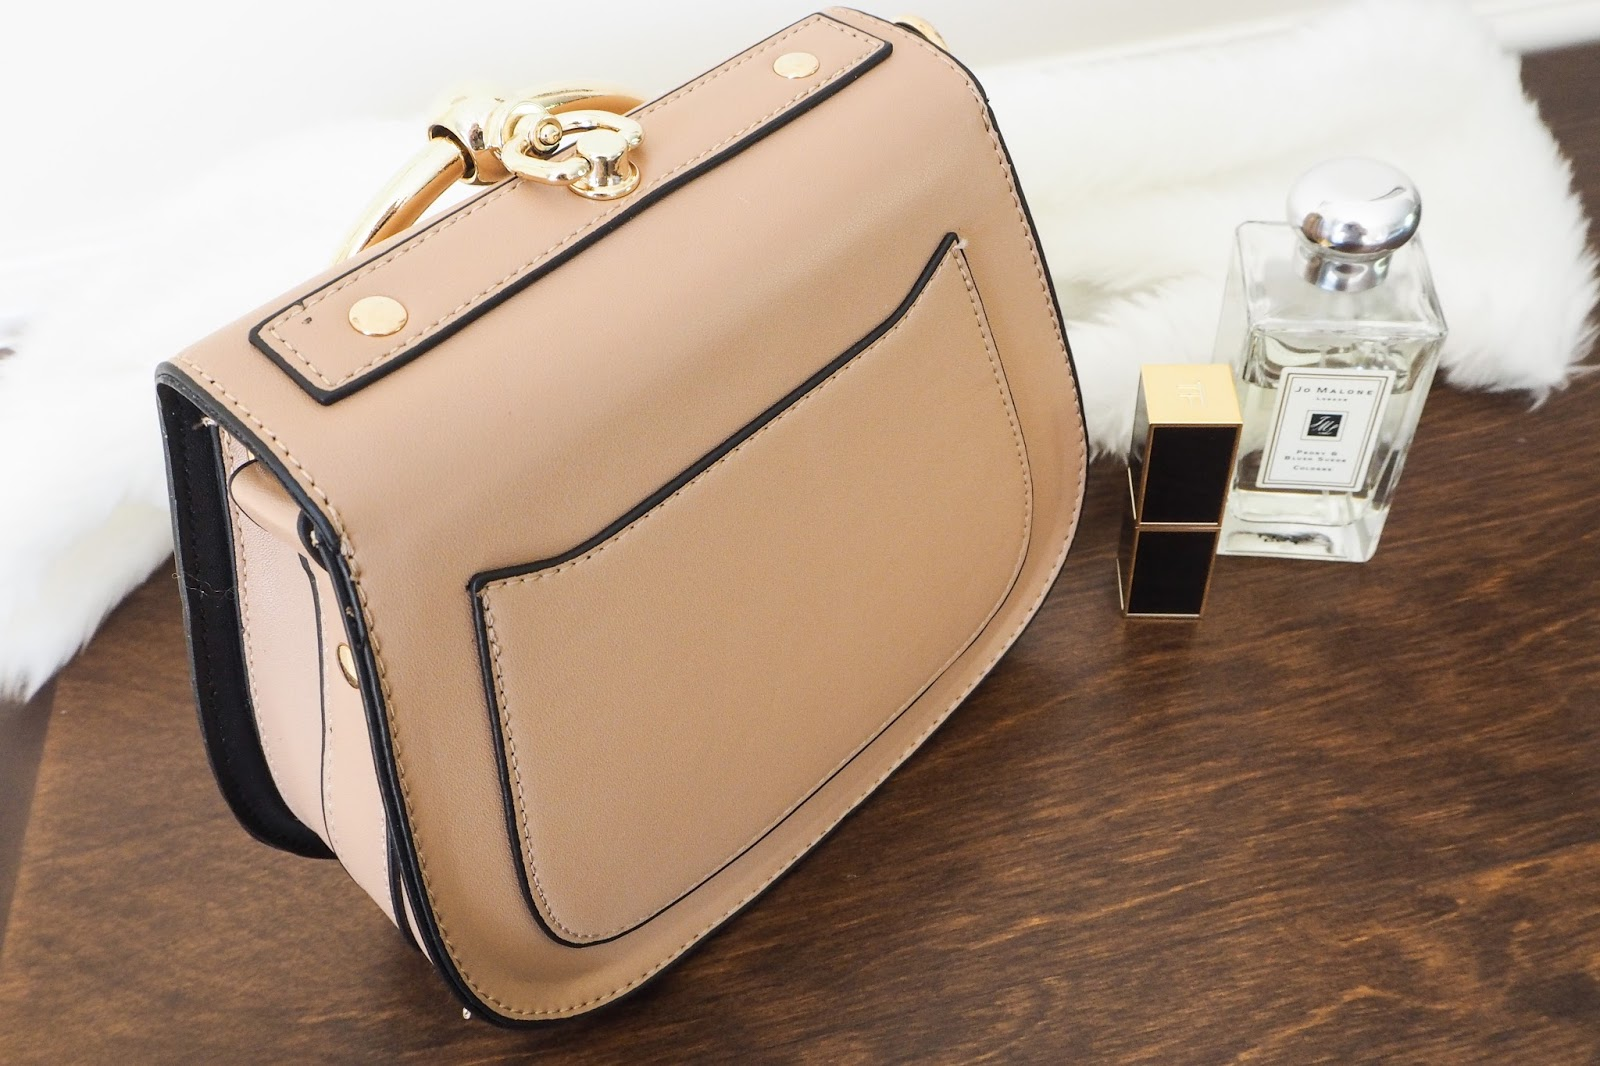 Back of the Chloe Nile dupe handbag